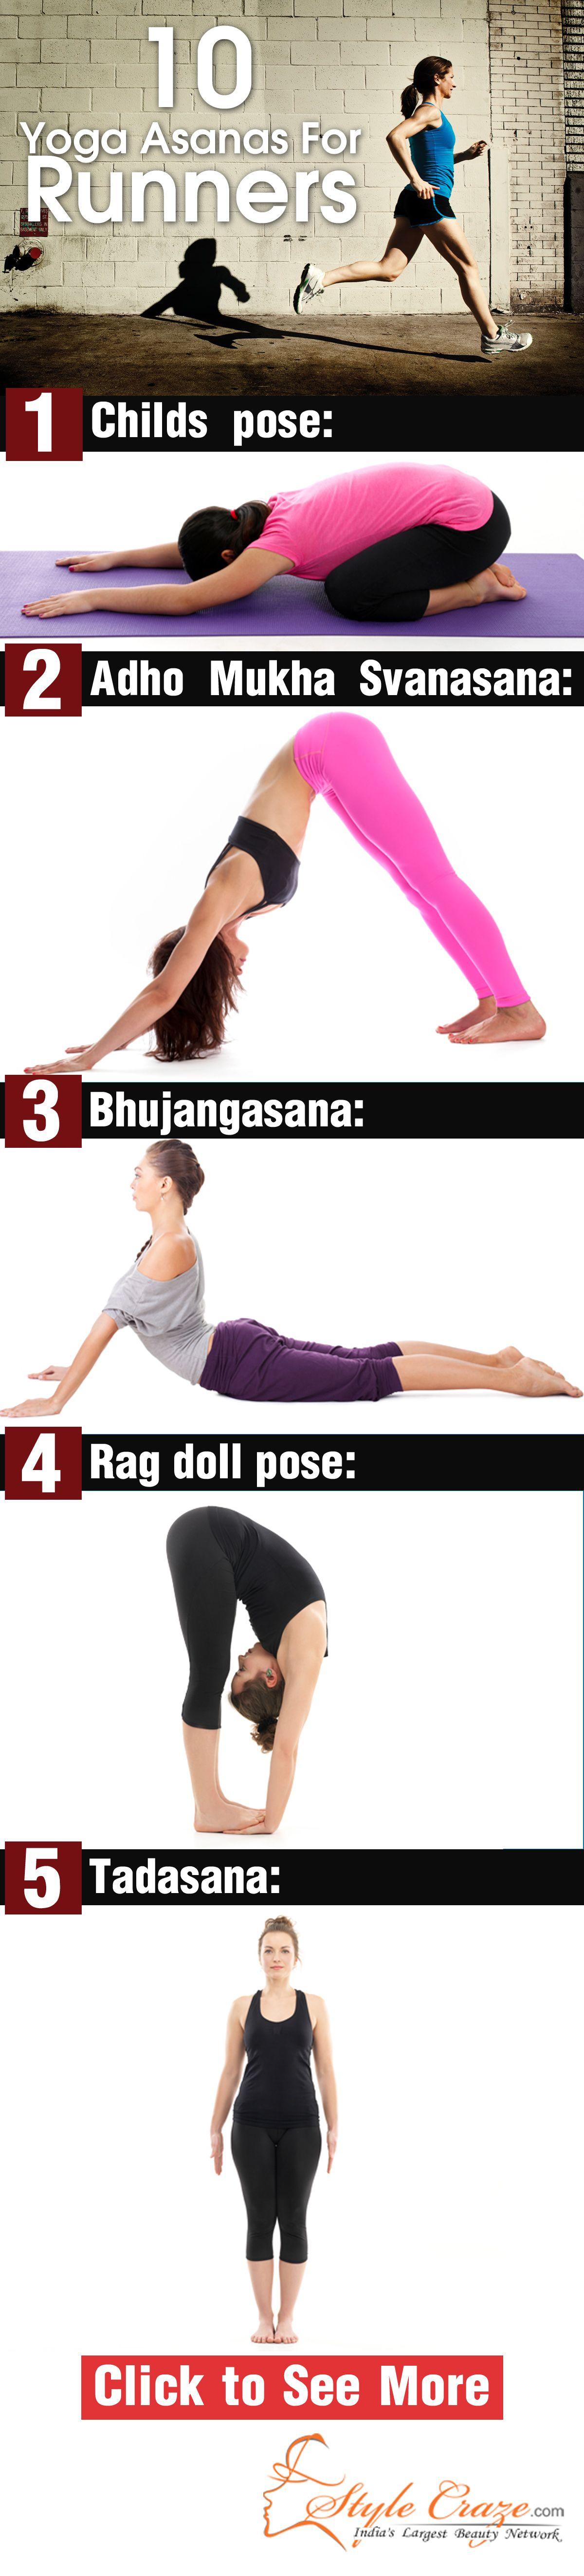 Amazing Benefits Of Yoga For Athletes  Children poses Practice